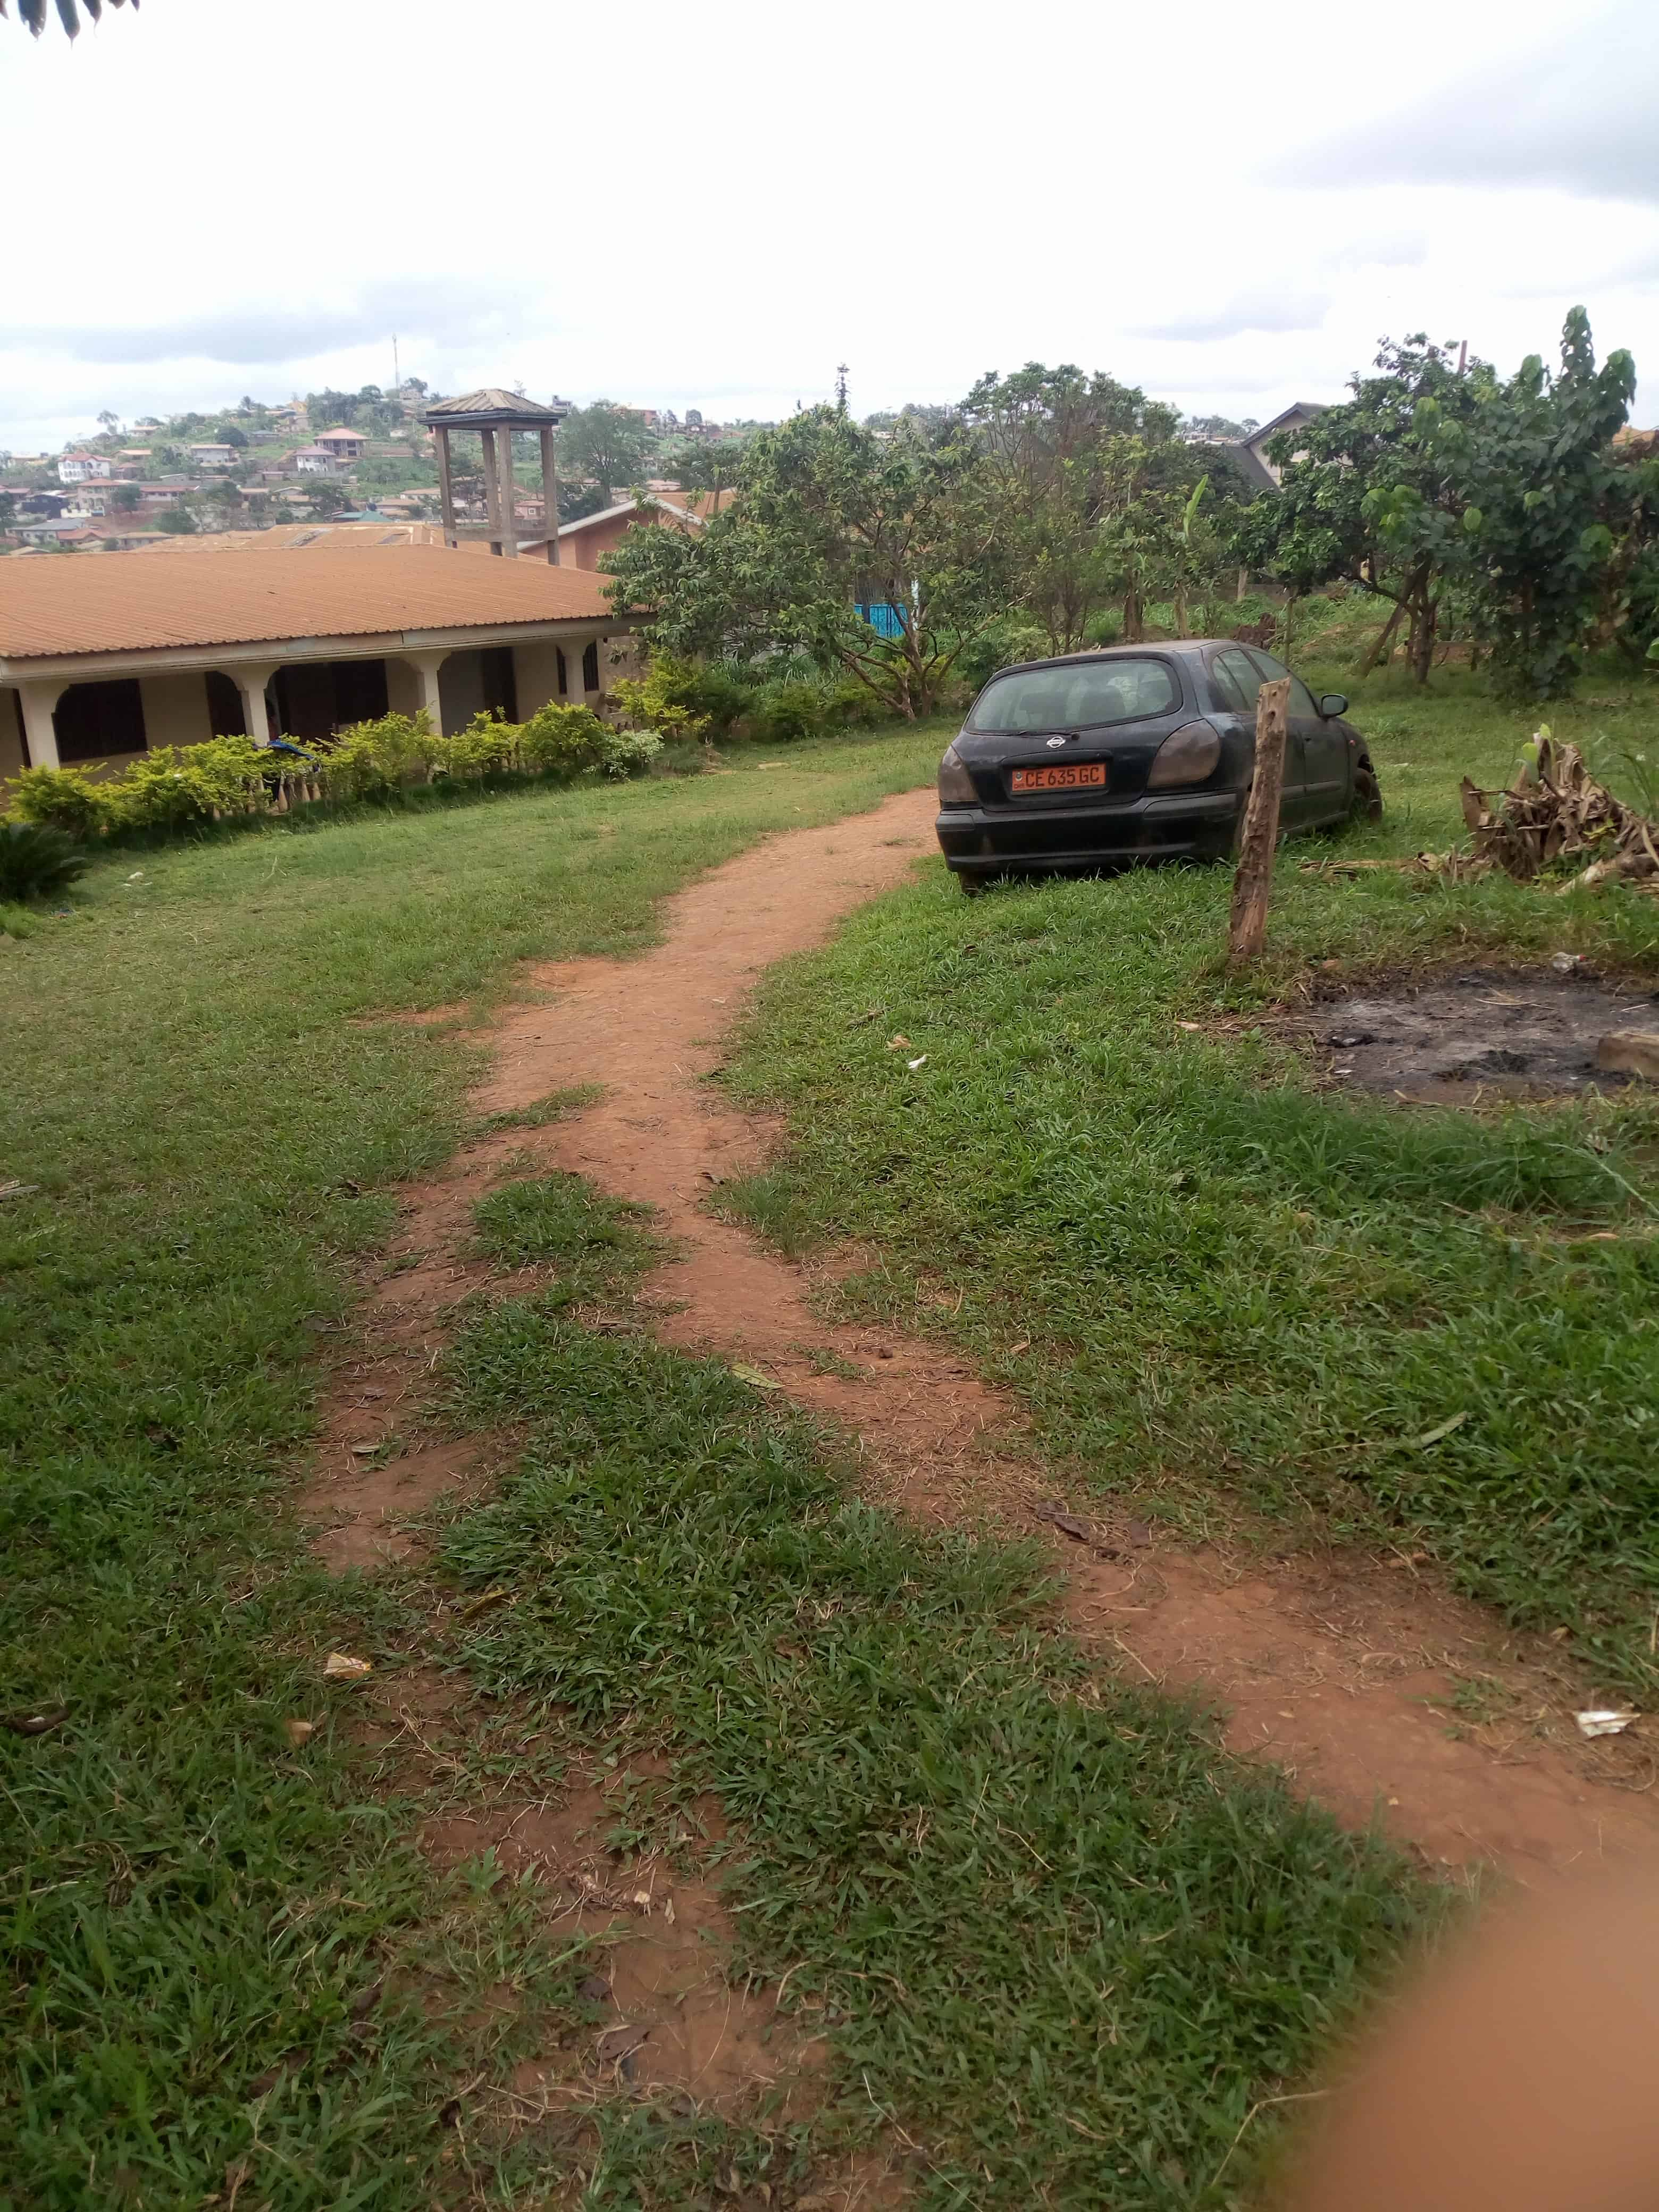 House (Villa) for sale - Yaoundé, Messame-Ndongo, Maison+ terrain à vendre à Yaoundé odza messamendongo - 1 living room(s), 4 bedroom(s), 3 bathroom(s) - 36 000 000 FCFA / month